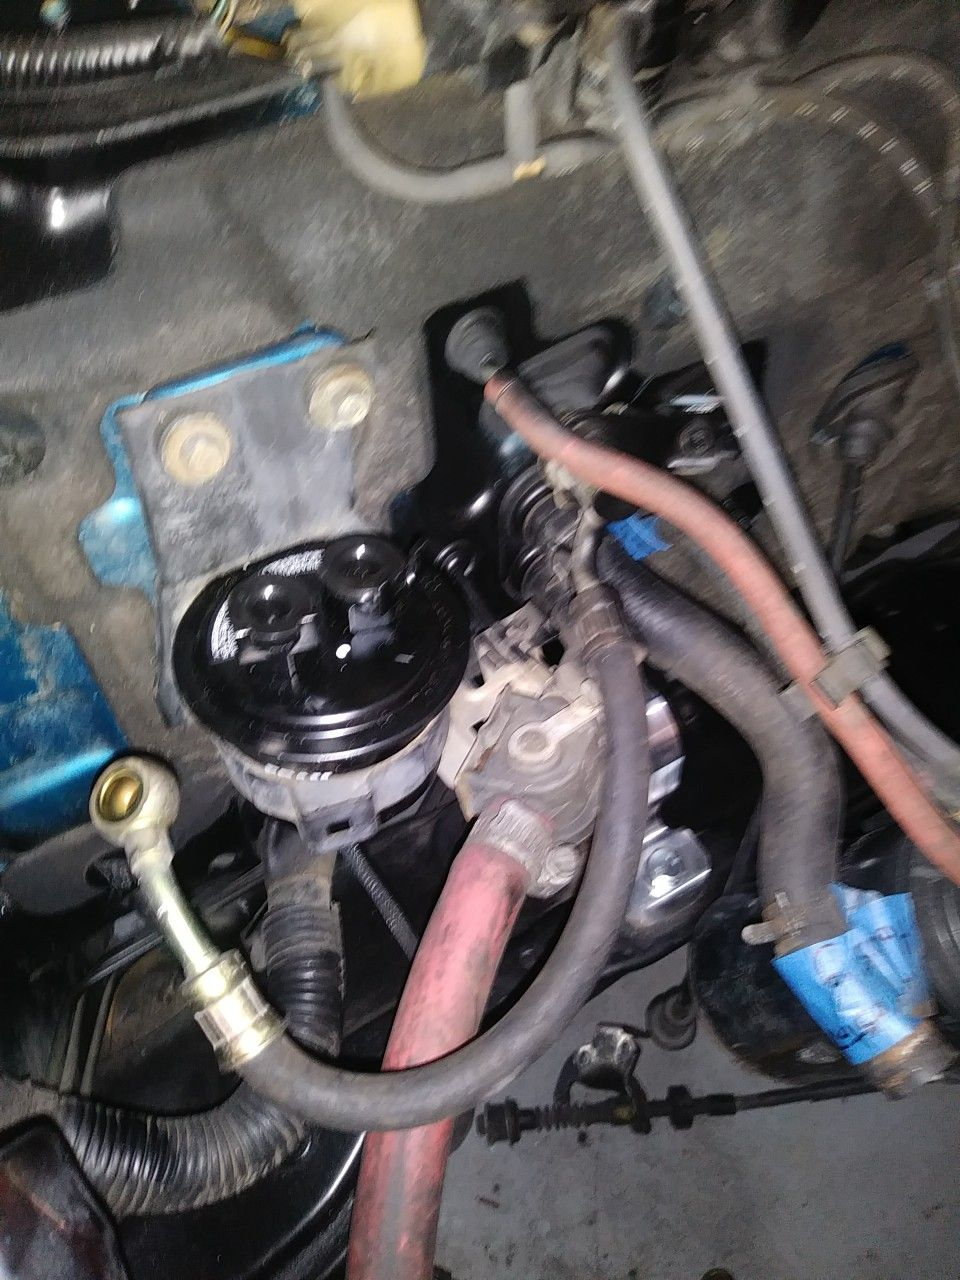 hight resolution of new fuel filter honda crx rebuild home appliances honda crxnew fuel filter honda crx